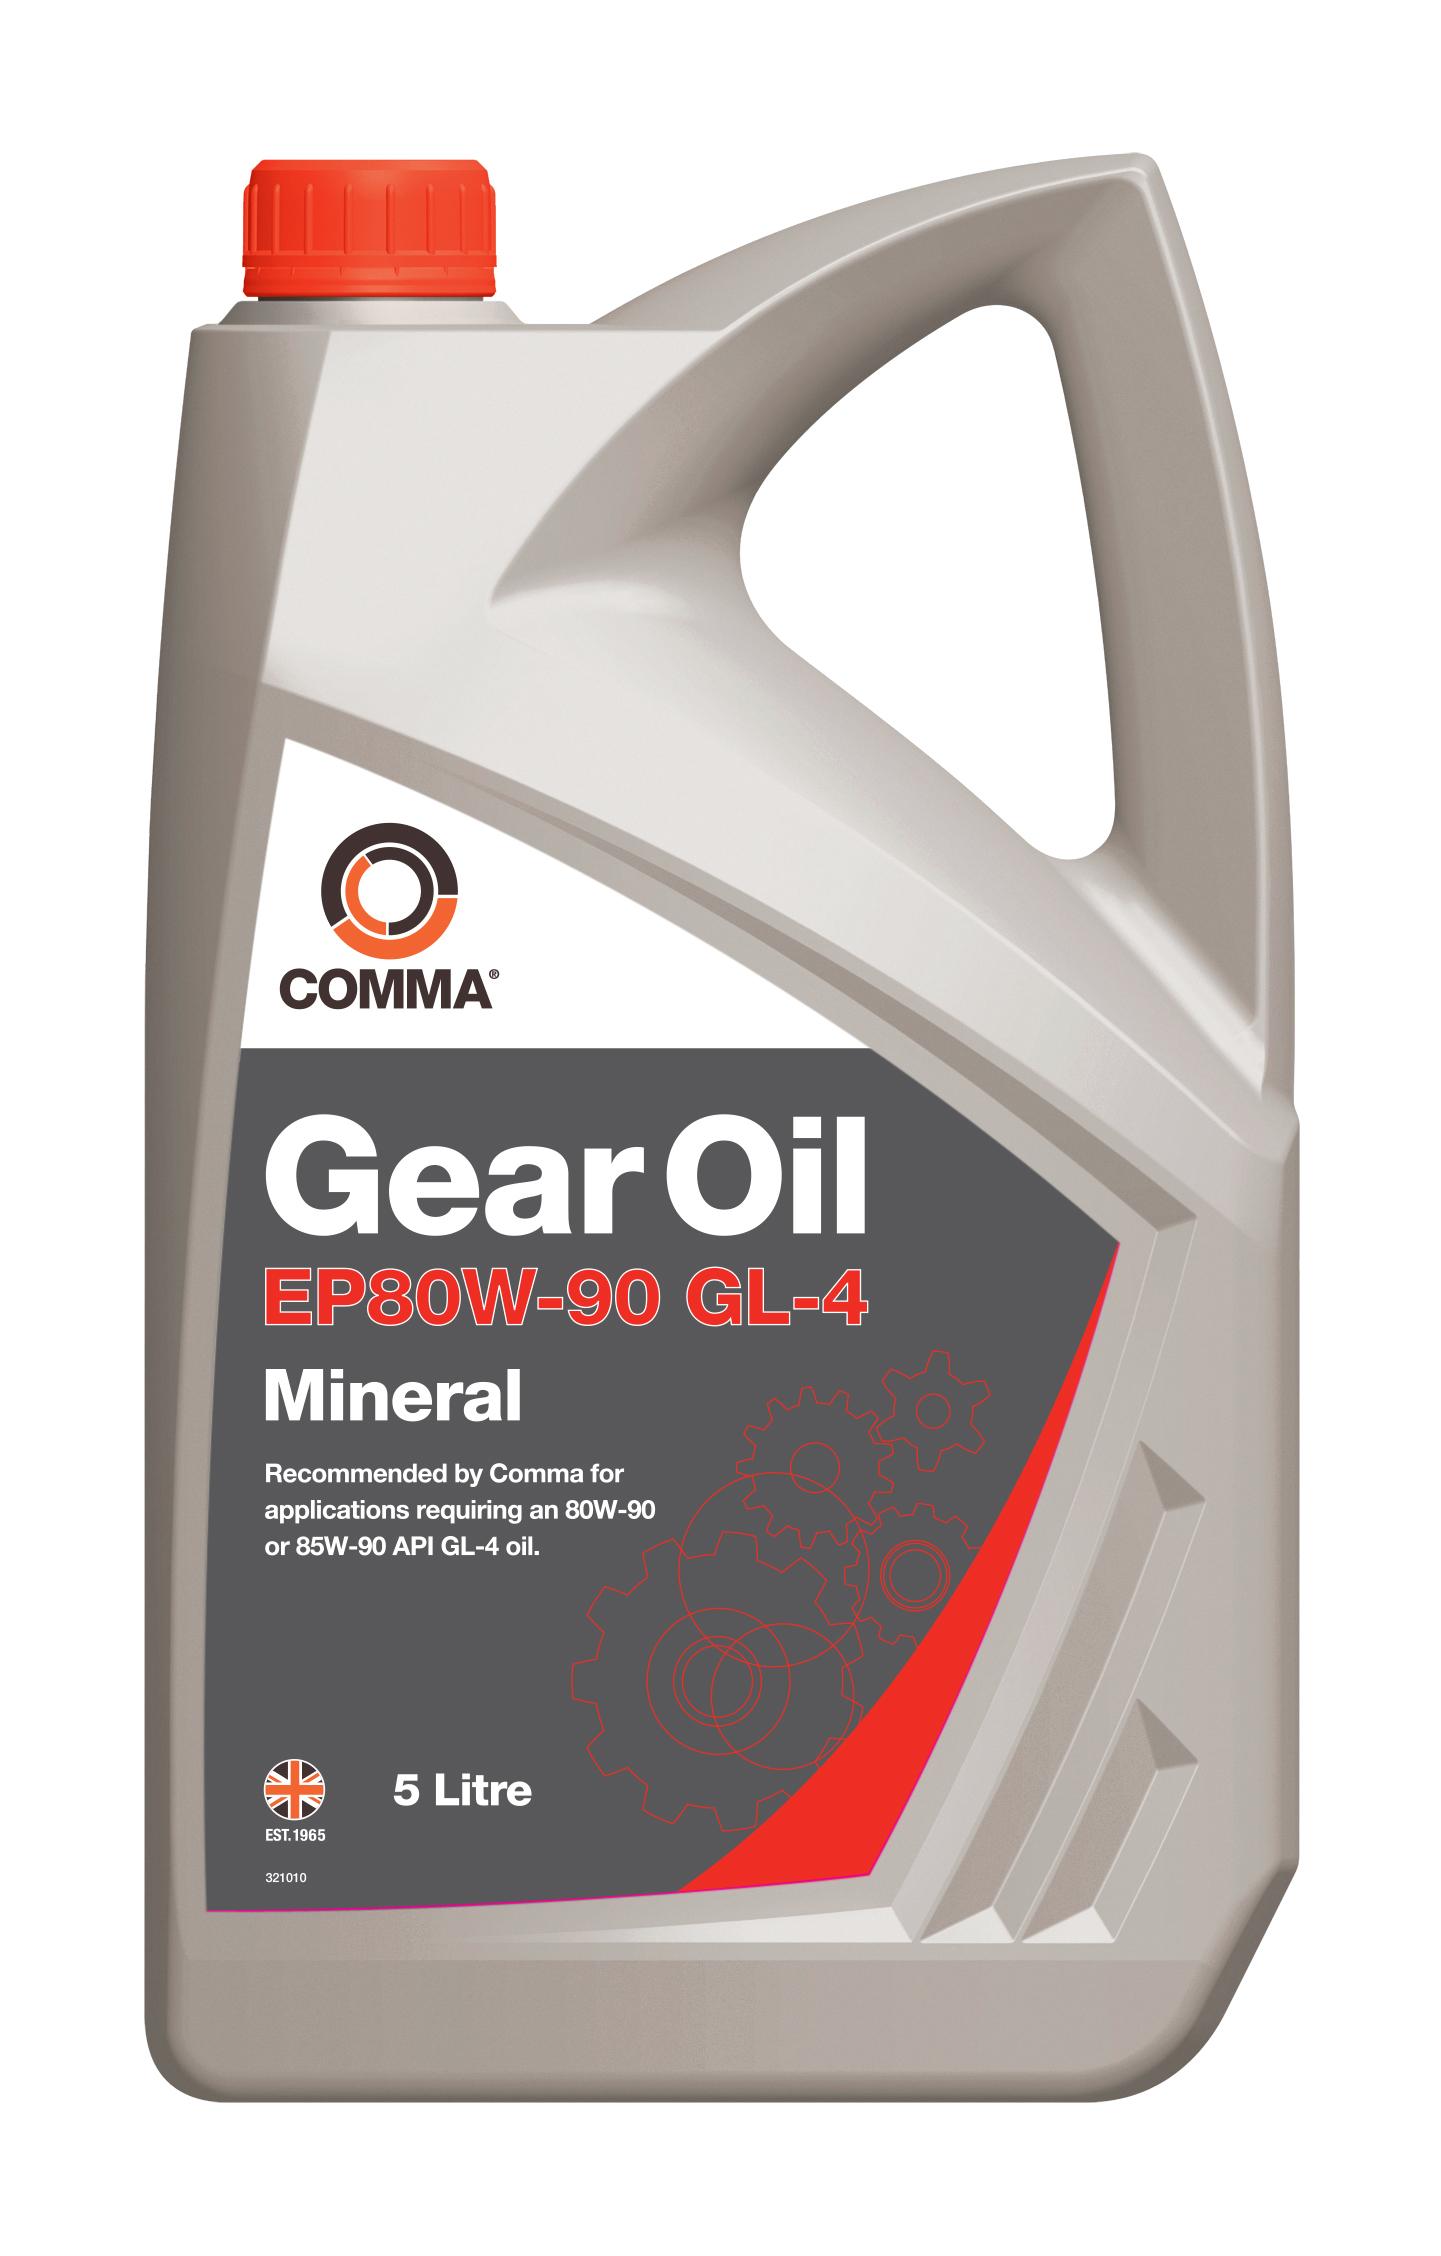 comma mineral gear oil ep80w 90 gl 4 5 litre go45l for 80w. Black Bedroom Furniture Sets. Home Design Ideas